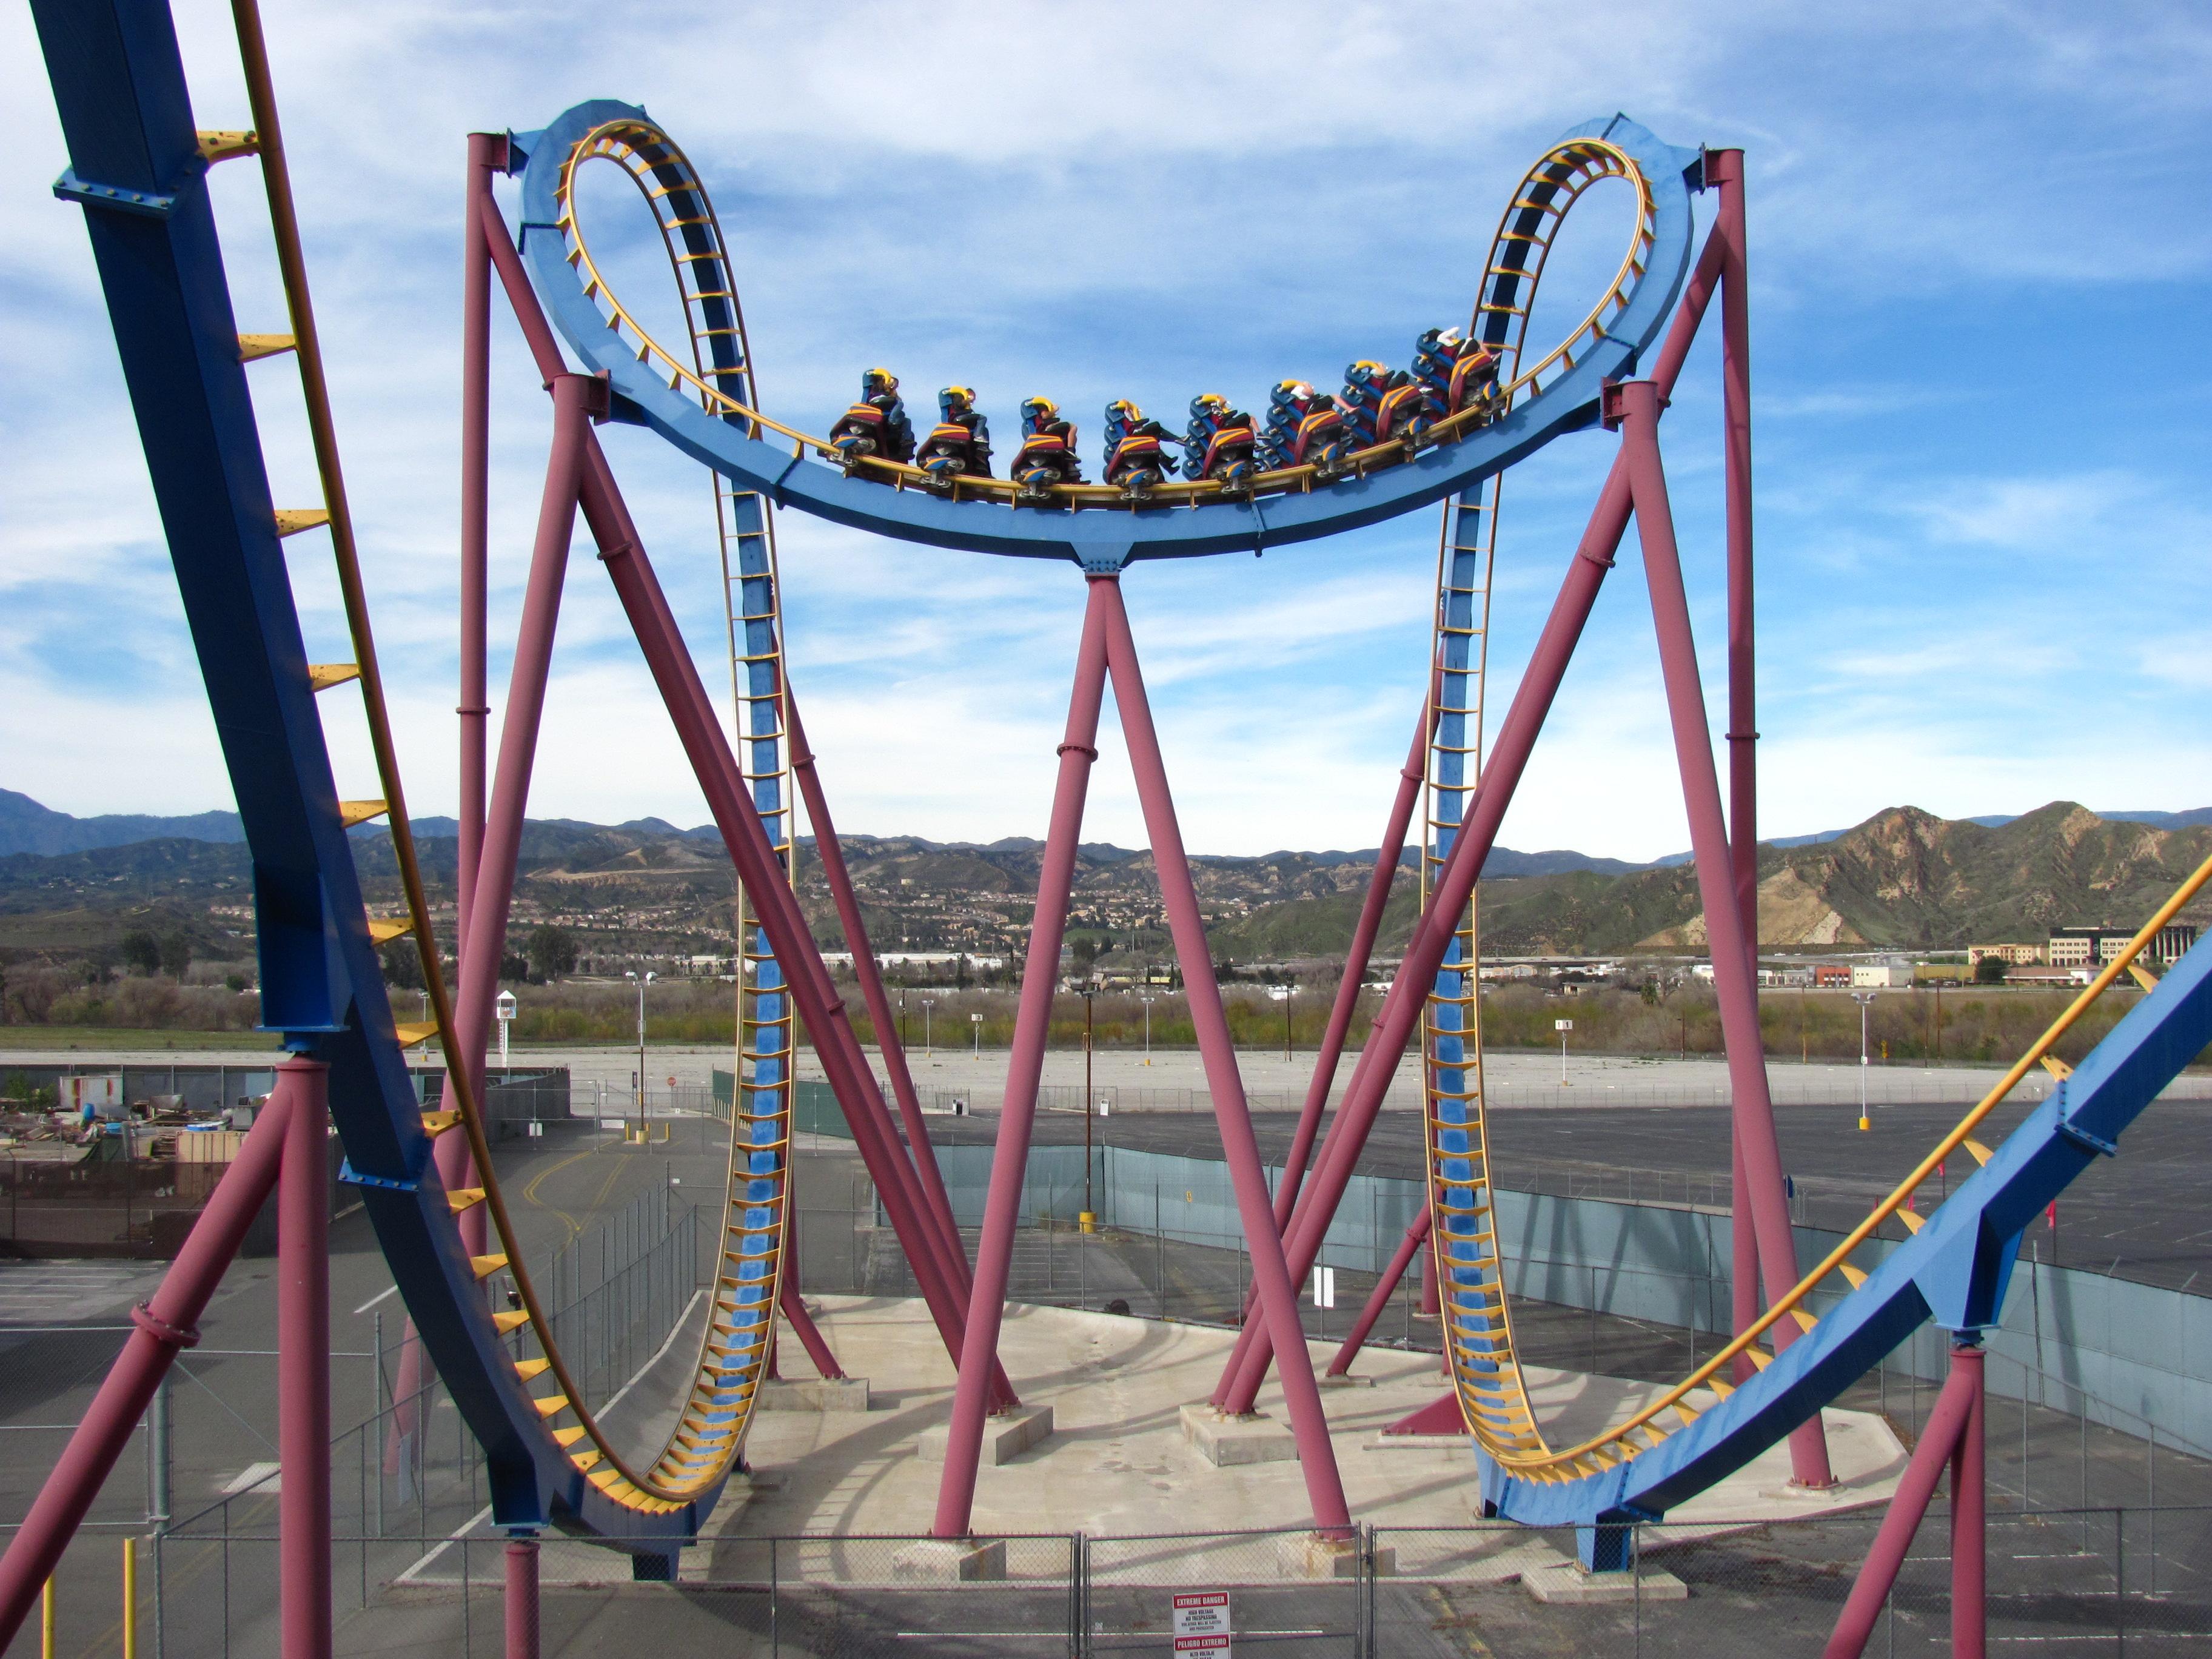 Roller coaster and a batman roller coaster roller coaster and a